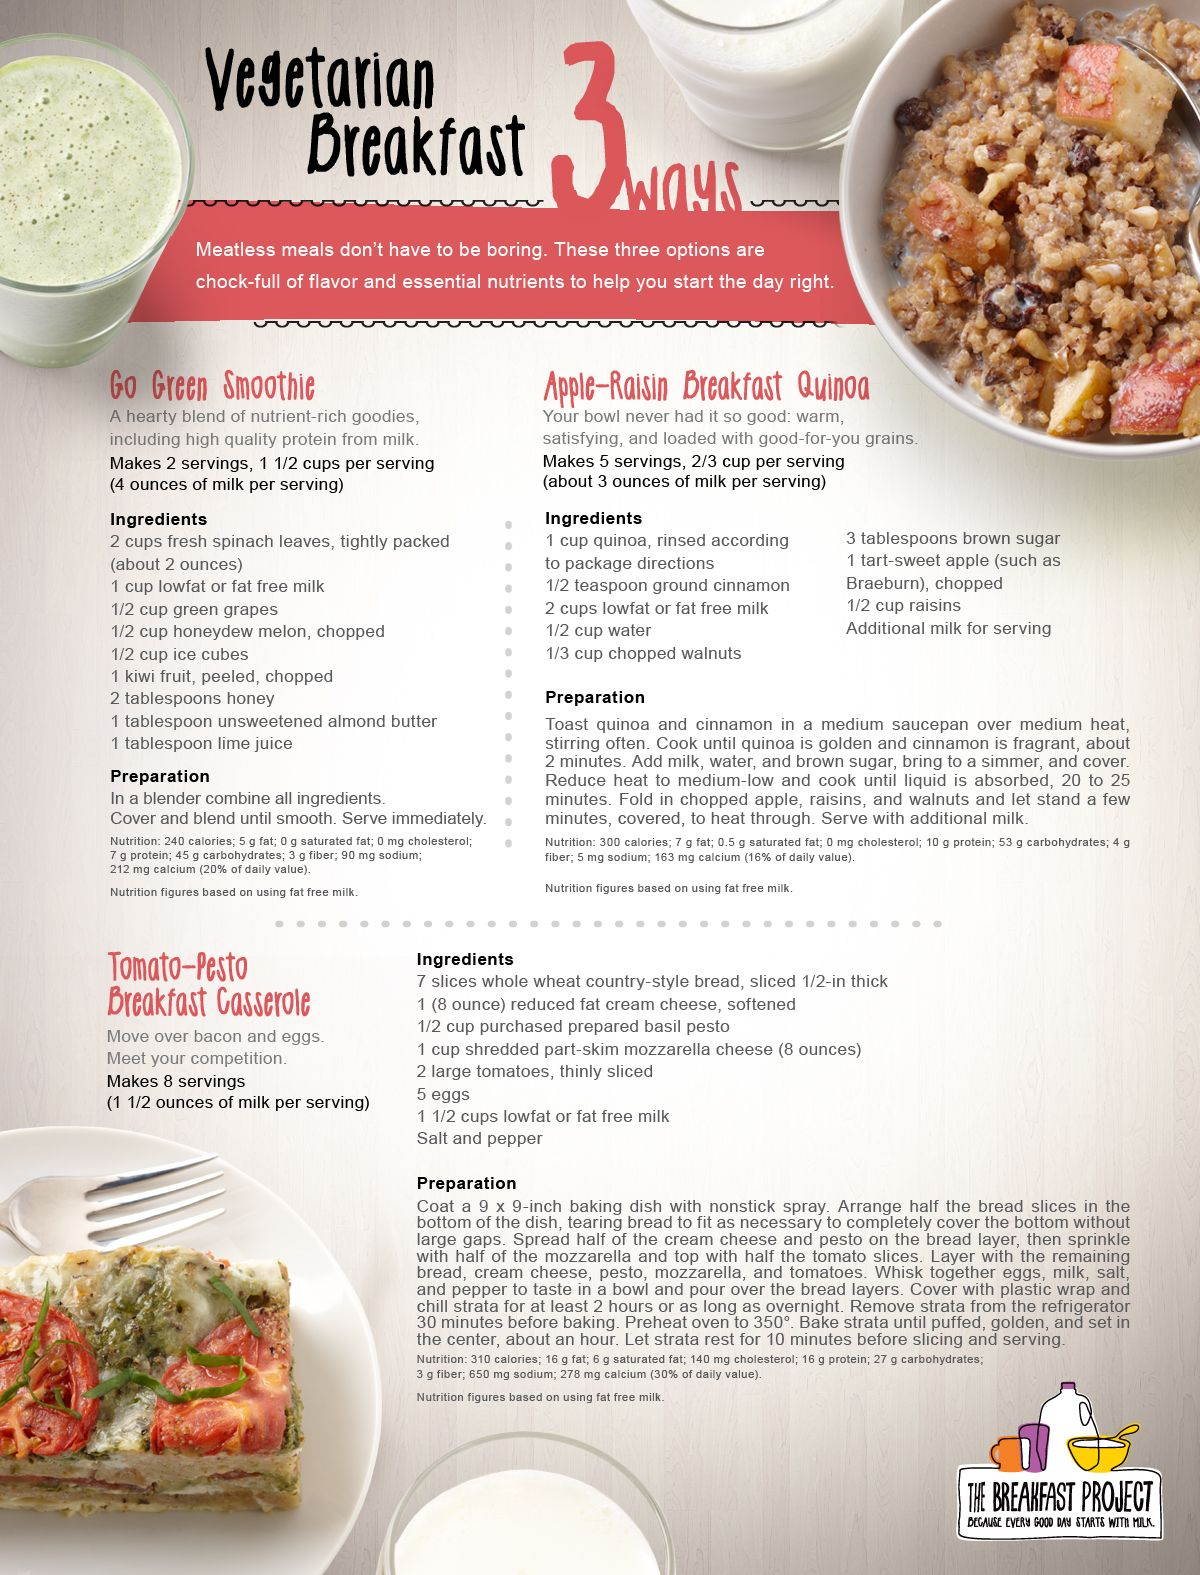 It S Vegetarian Month We Ve Got 3 Vegified Breakfast Recipes To Celebrate Which One Will You Wan Vegetarian Breakfast Recipes Vegetarian Vegetarian Breakfast